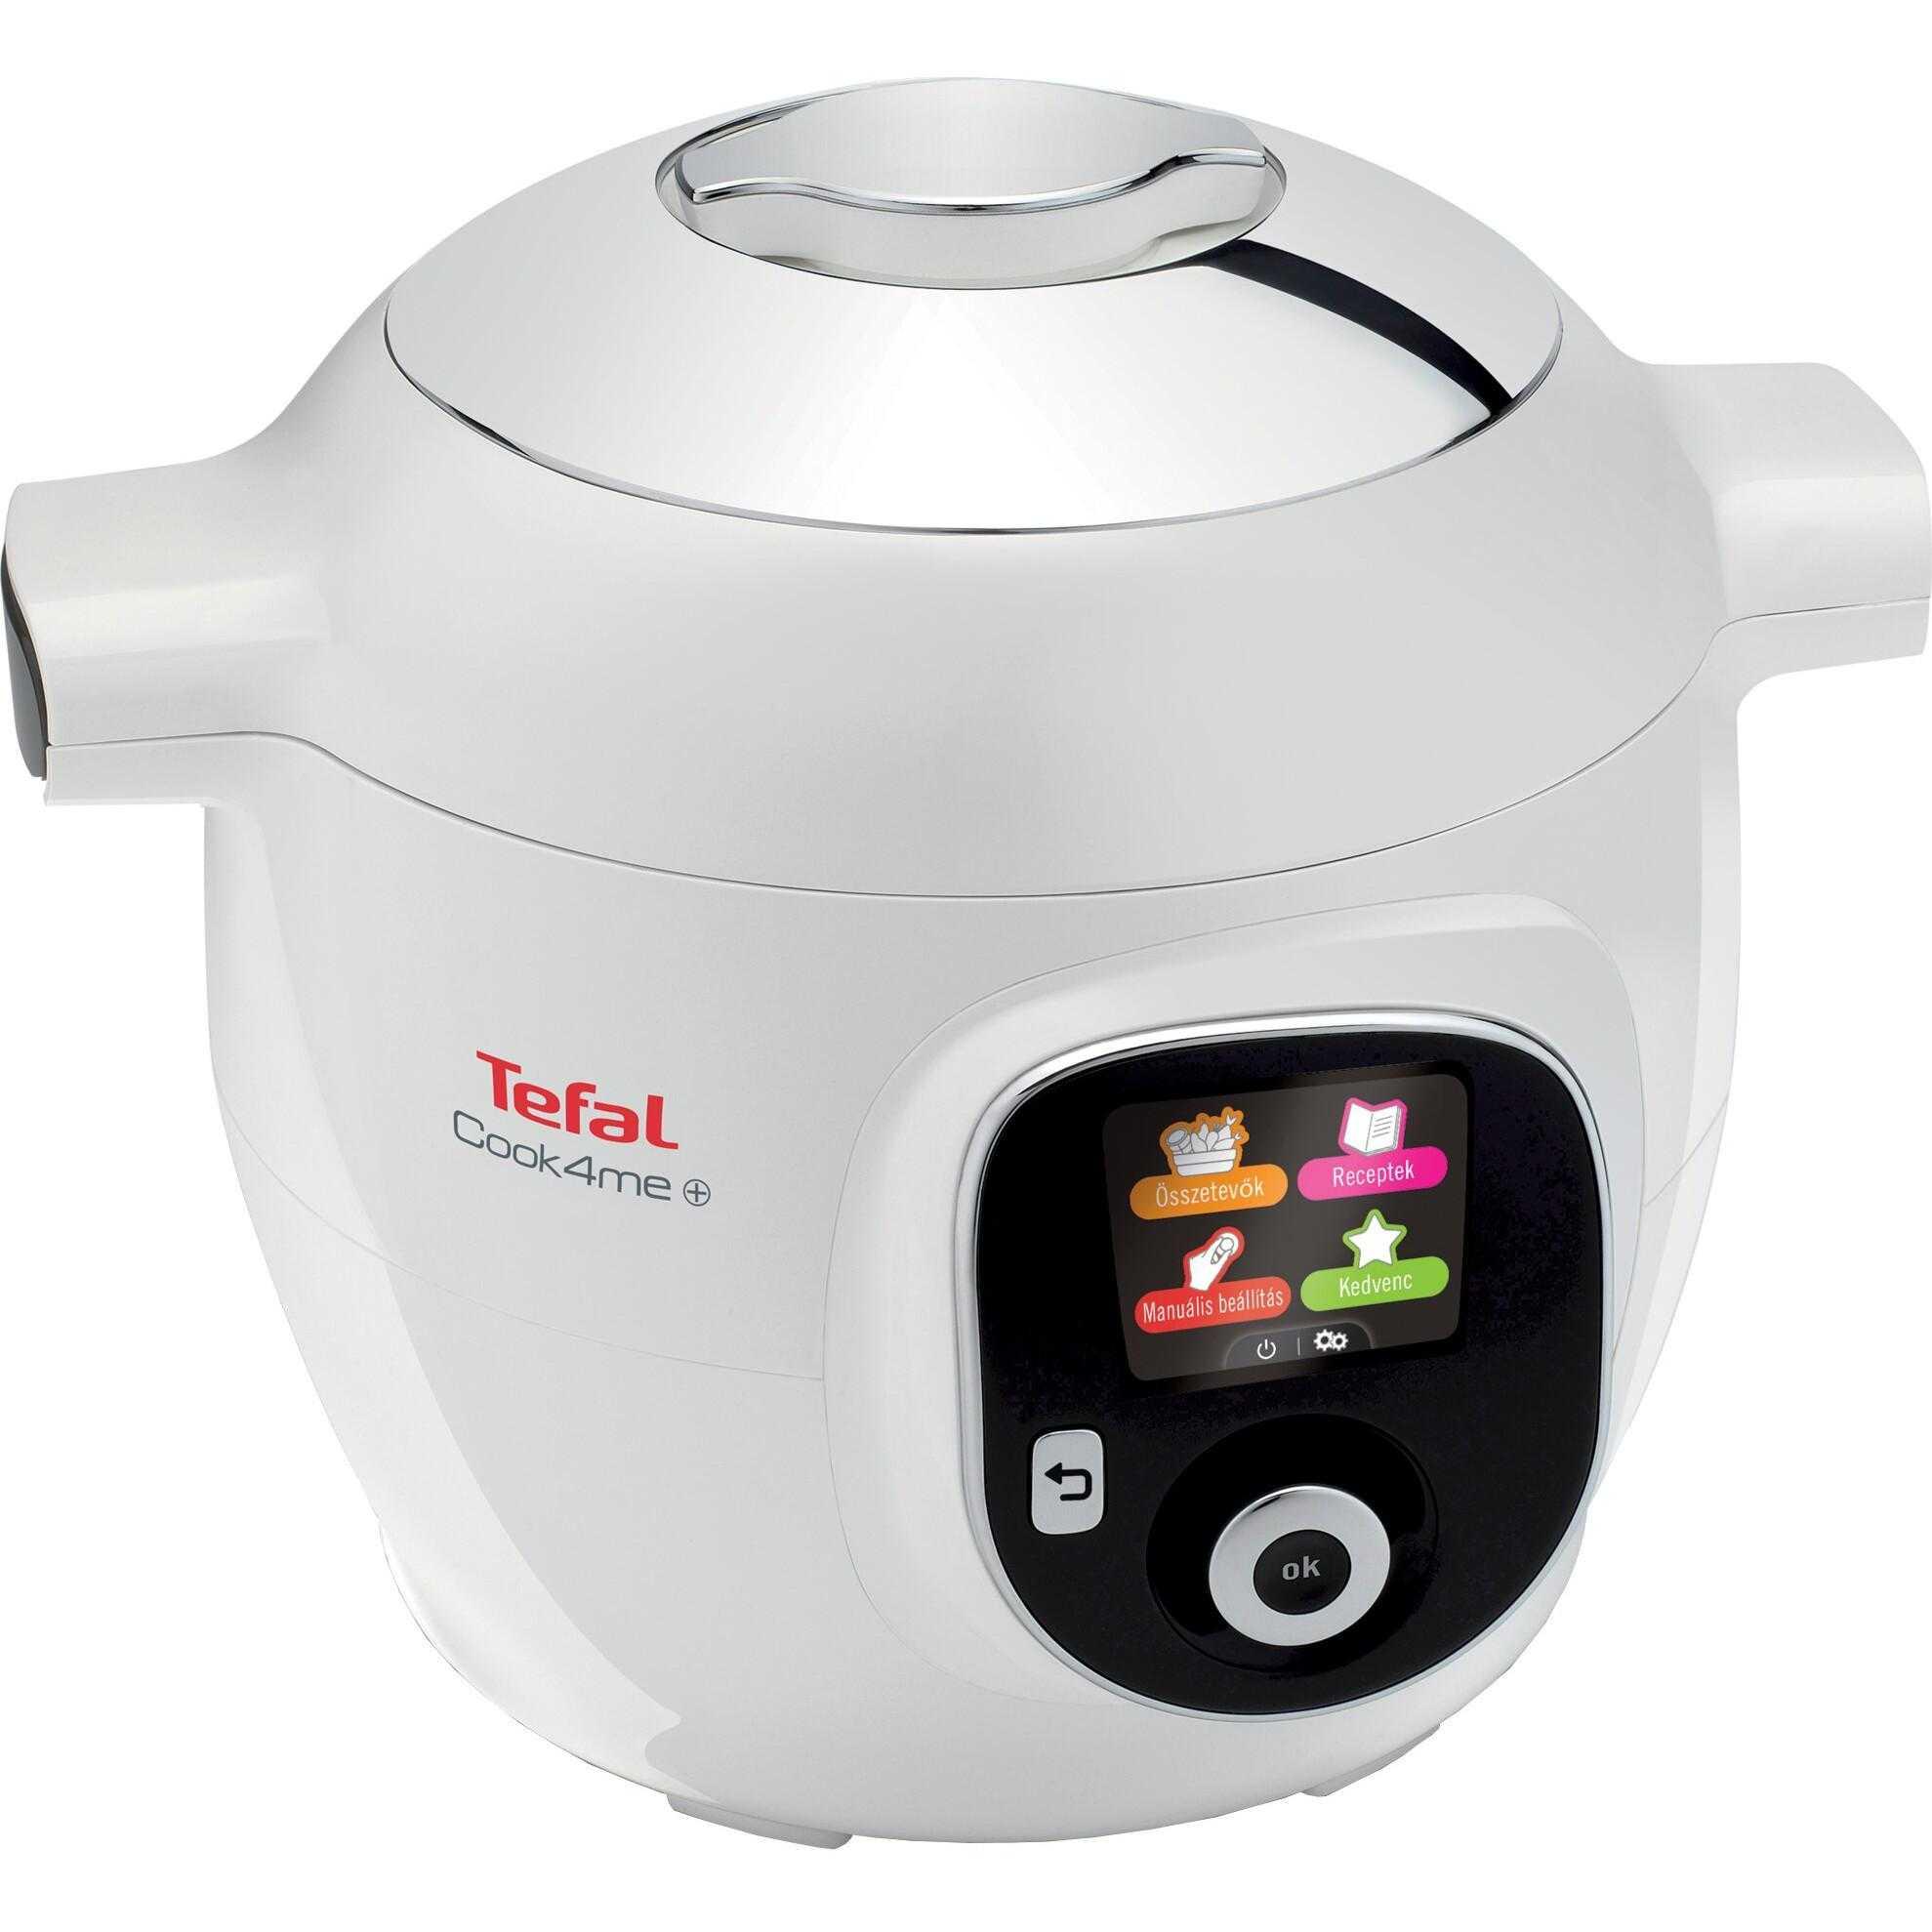 Multicooker inteligent Tefal Cook4Me+ CY851130, 1600 W, 6 l, 150 retete, 6 moduri de gatit, Alb